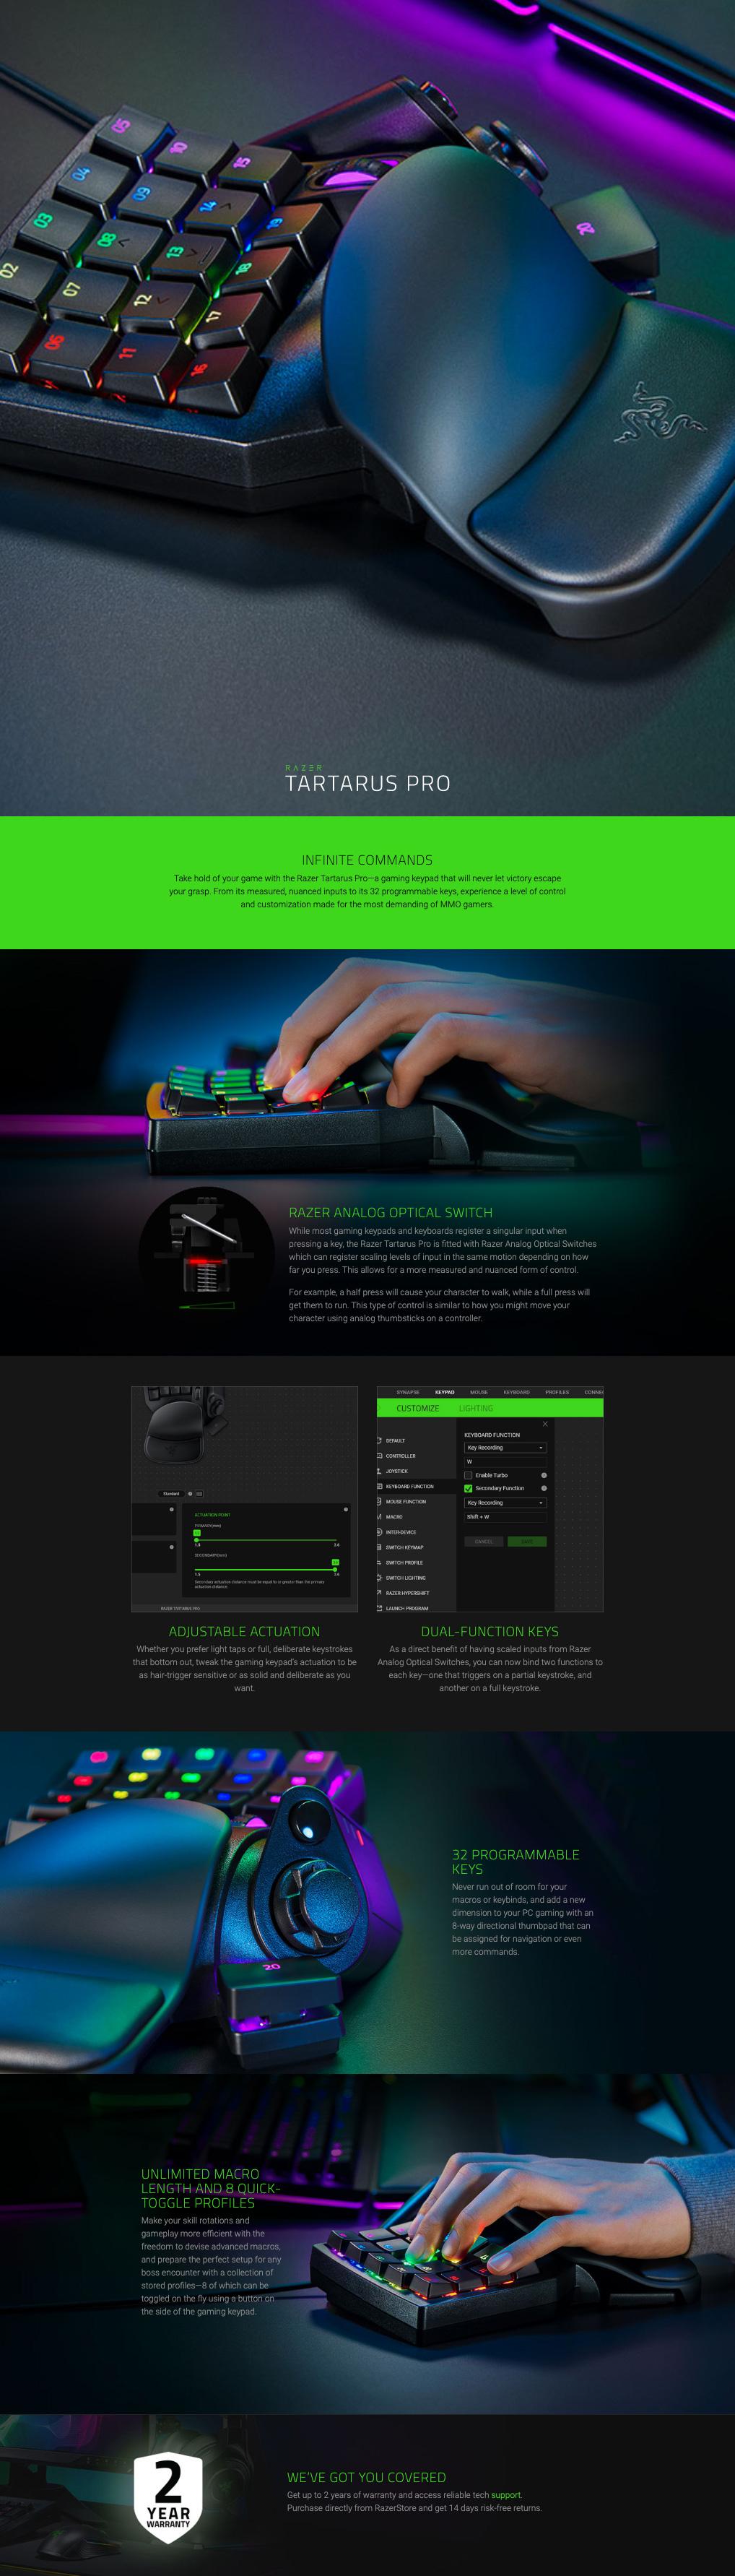 Razer Tartarus Pro Analog Optical Gaming Keypad features